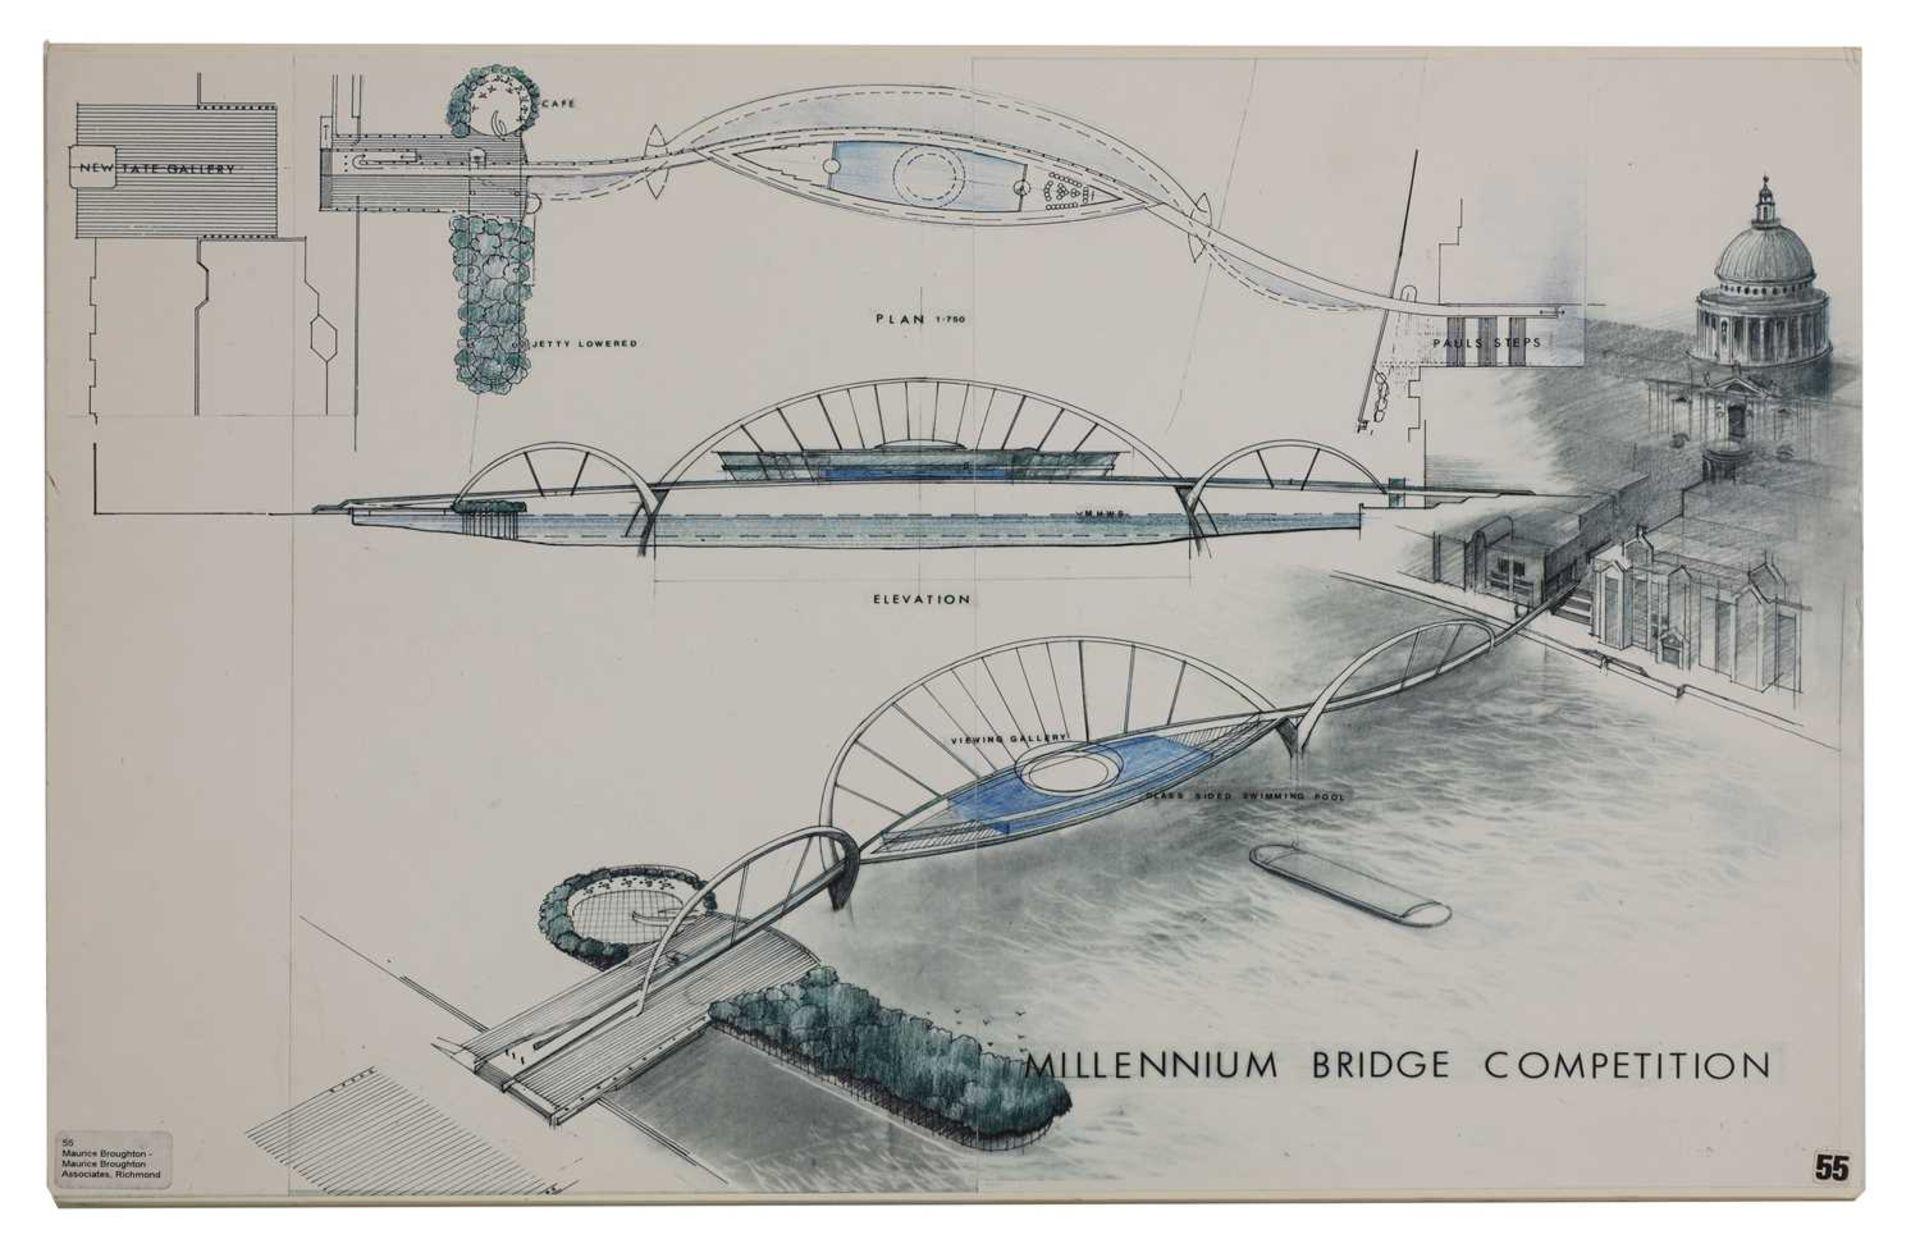 Maurice Broughton Associates,